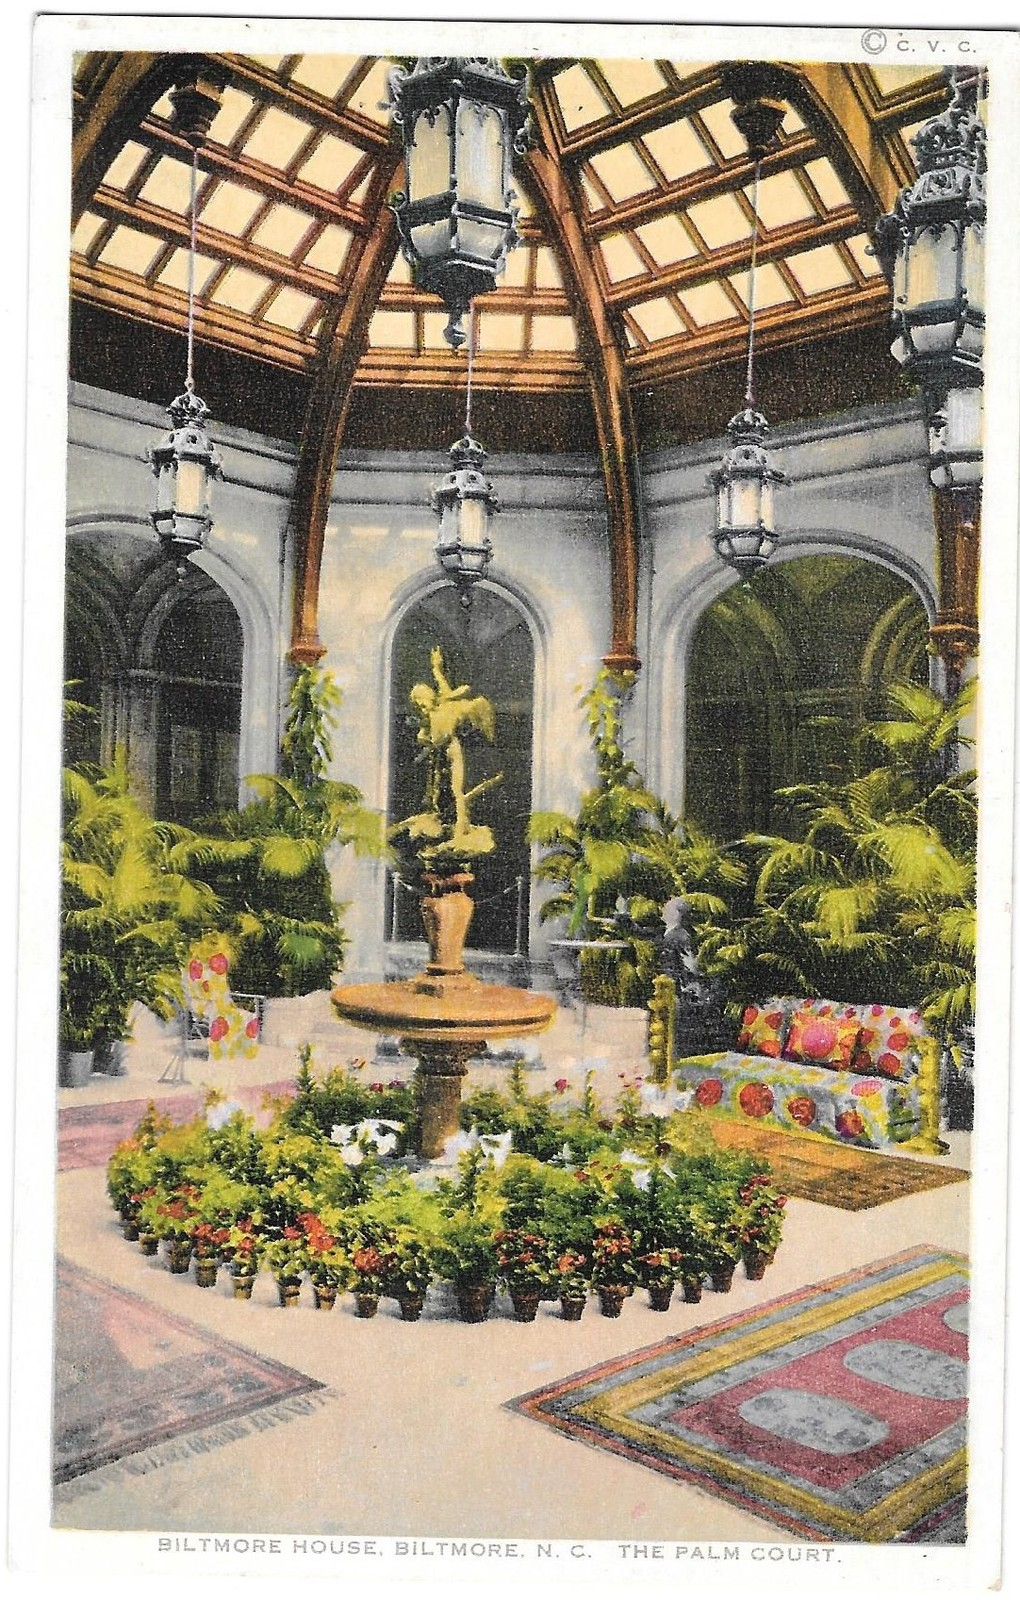 NC Biltmore House Palm Court Viintage Photostint North Carolina Postcard  - $4.99